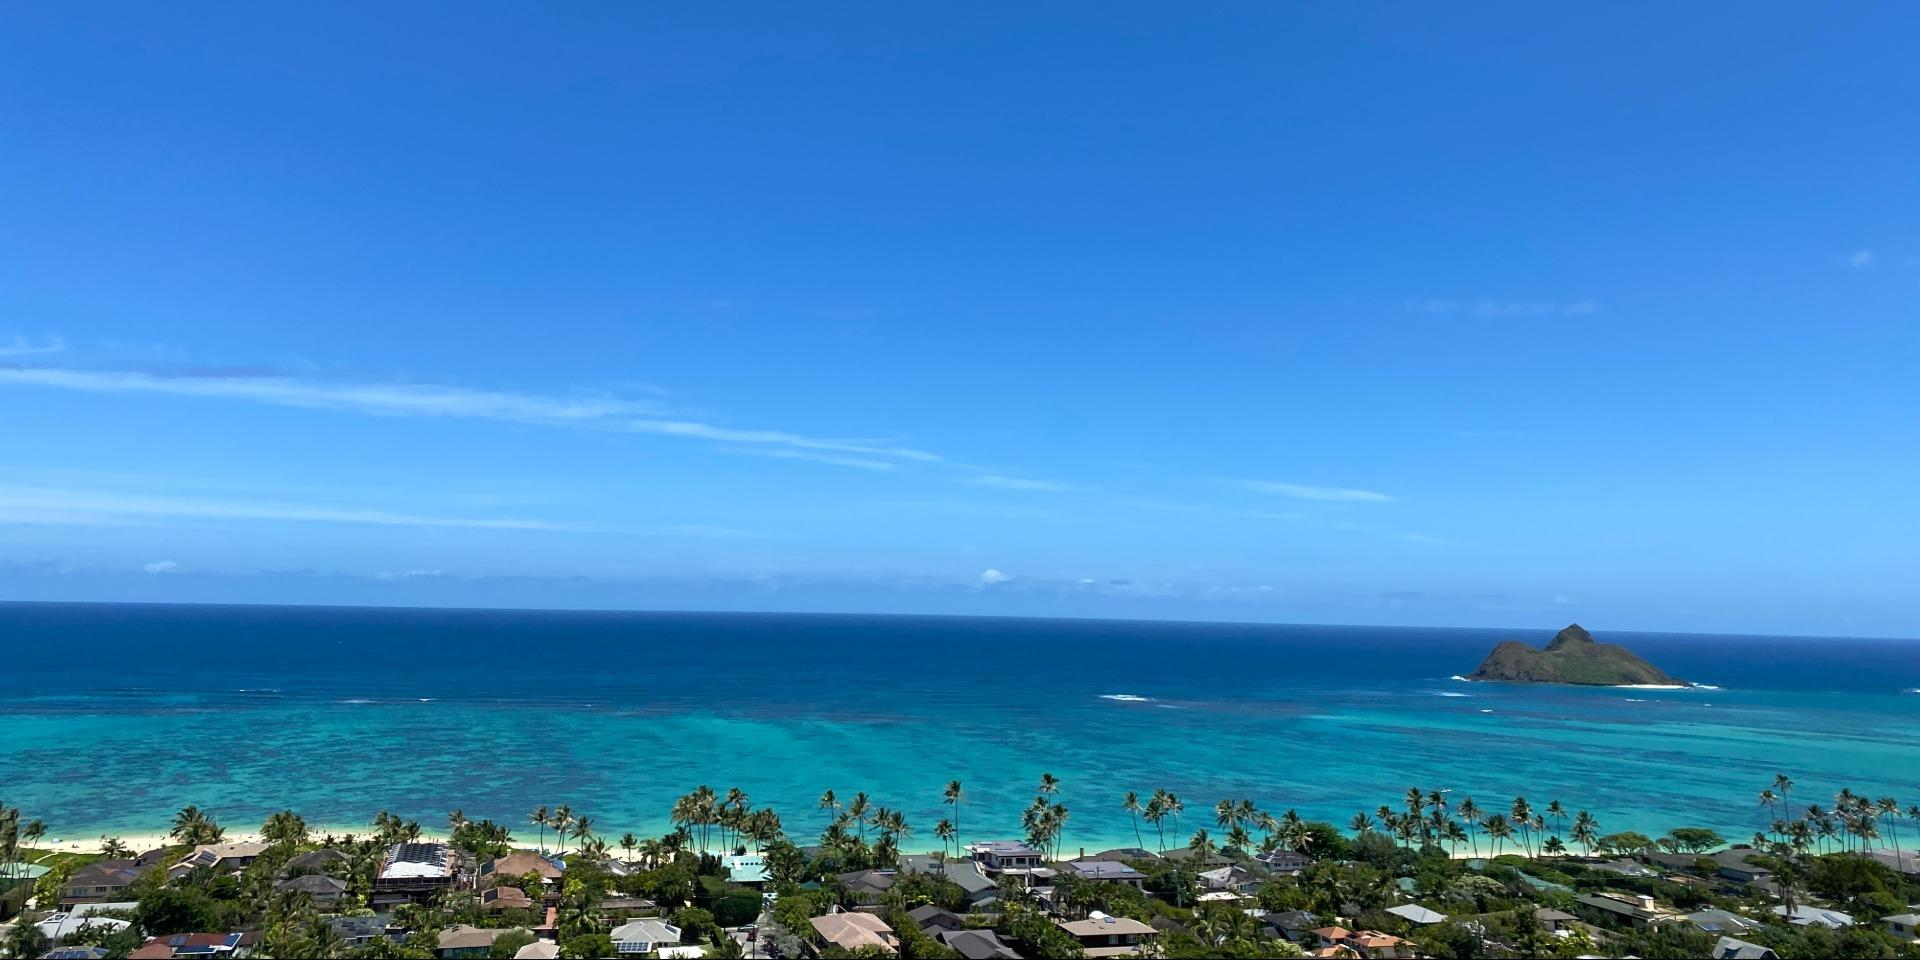 Hawaii Blues Zoom Background